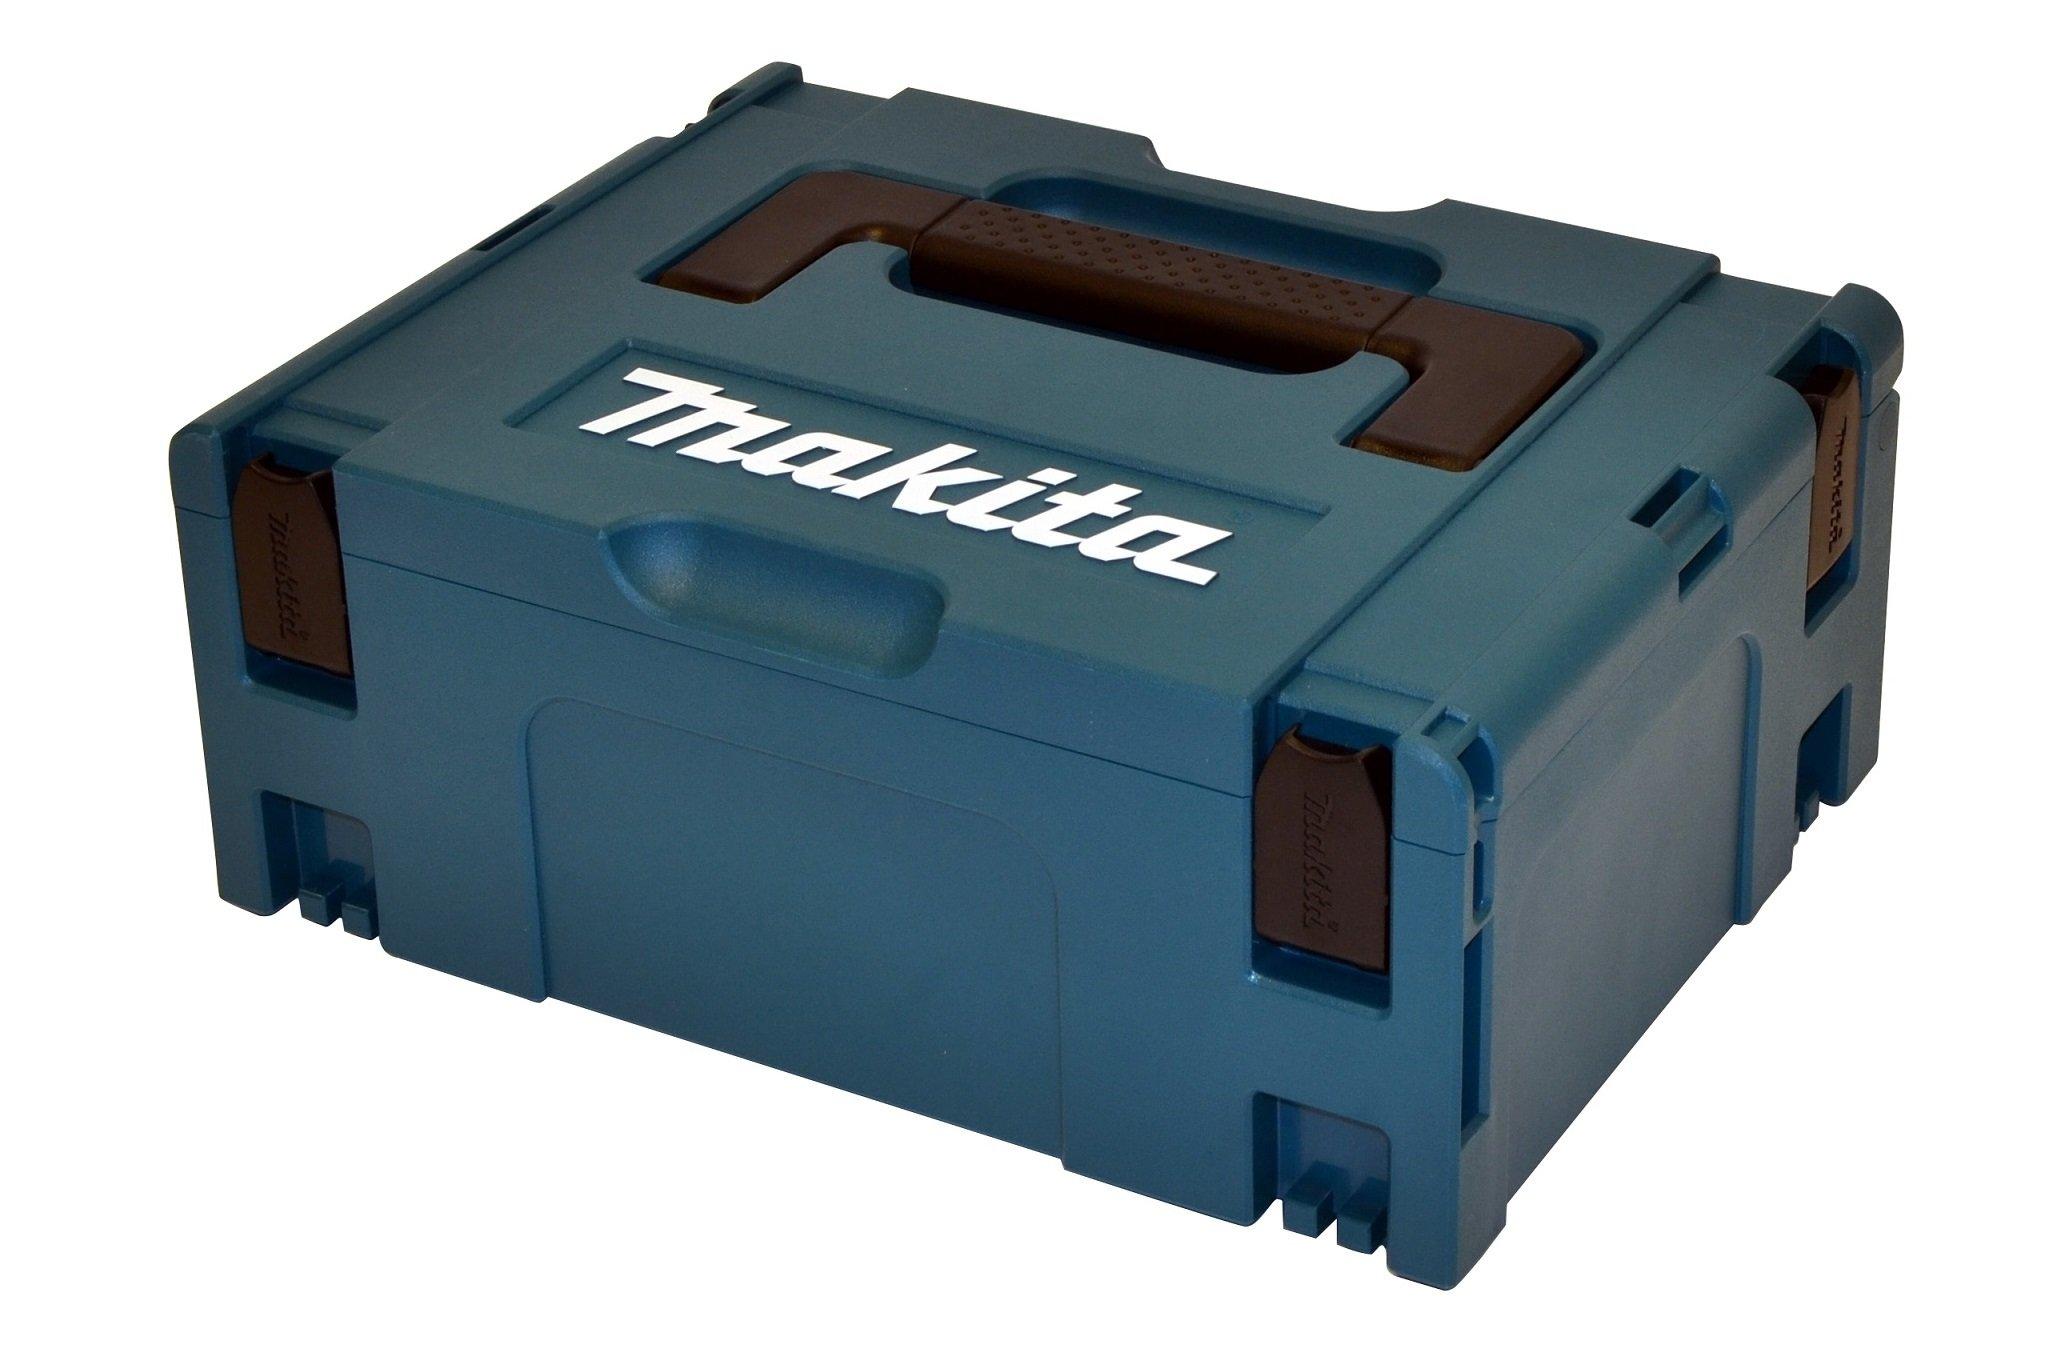 Makita-Akku-Bohrschrauber-18-V-15-Ah-DDF456RHJ